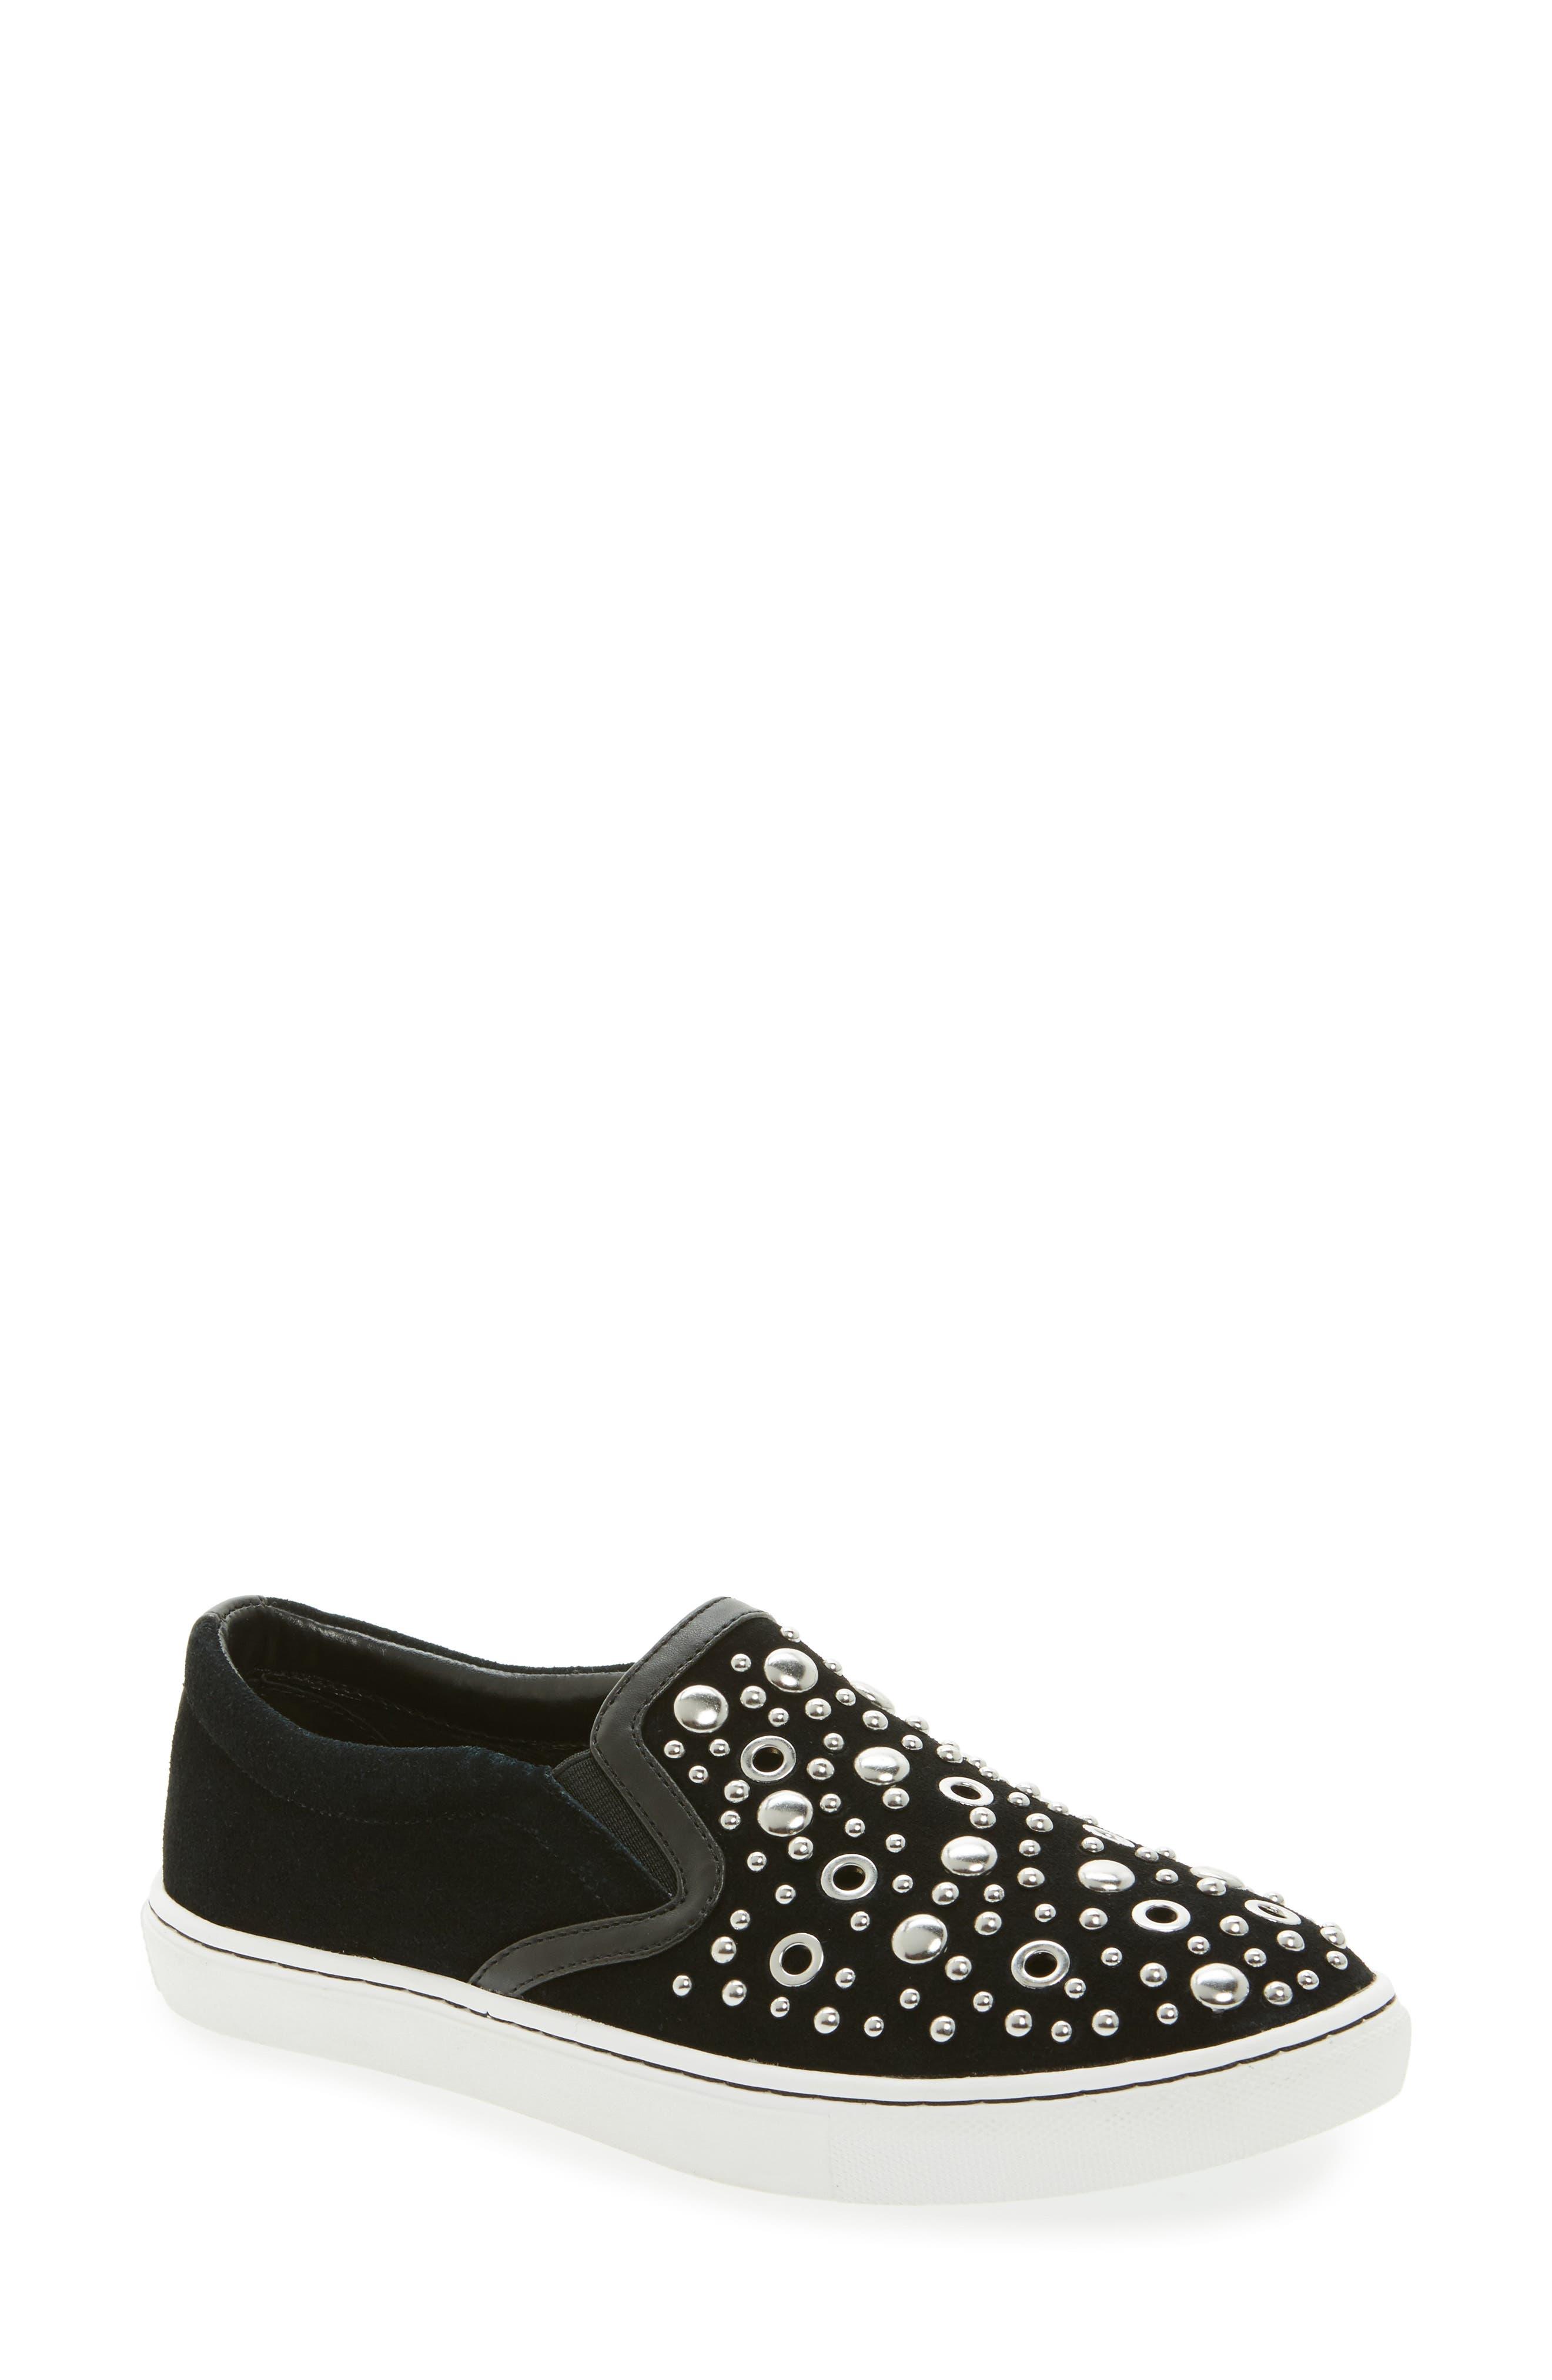 Paven Embellished Slip-On Sneaker,                             Main thumbnail 1, color,                             001